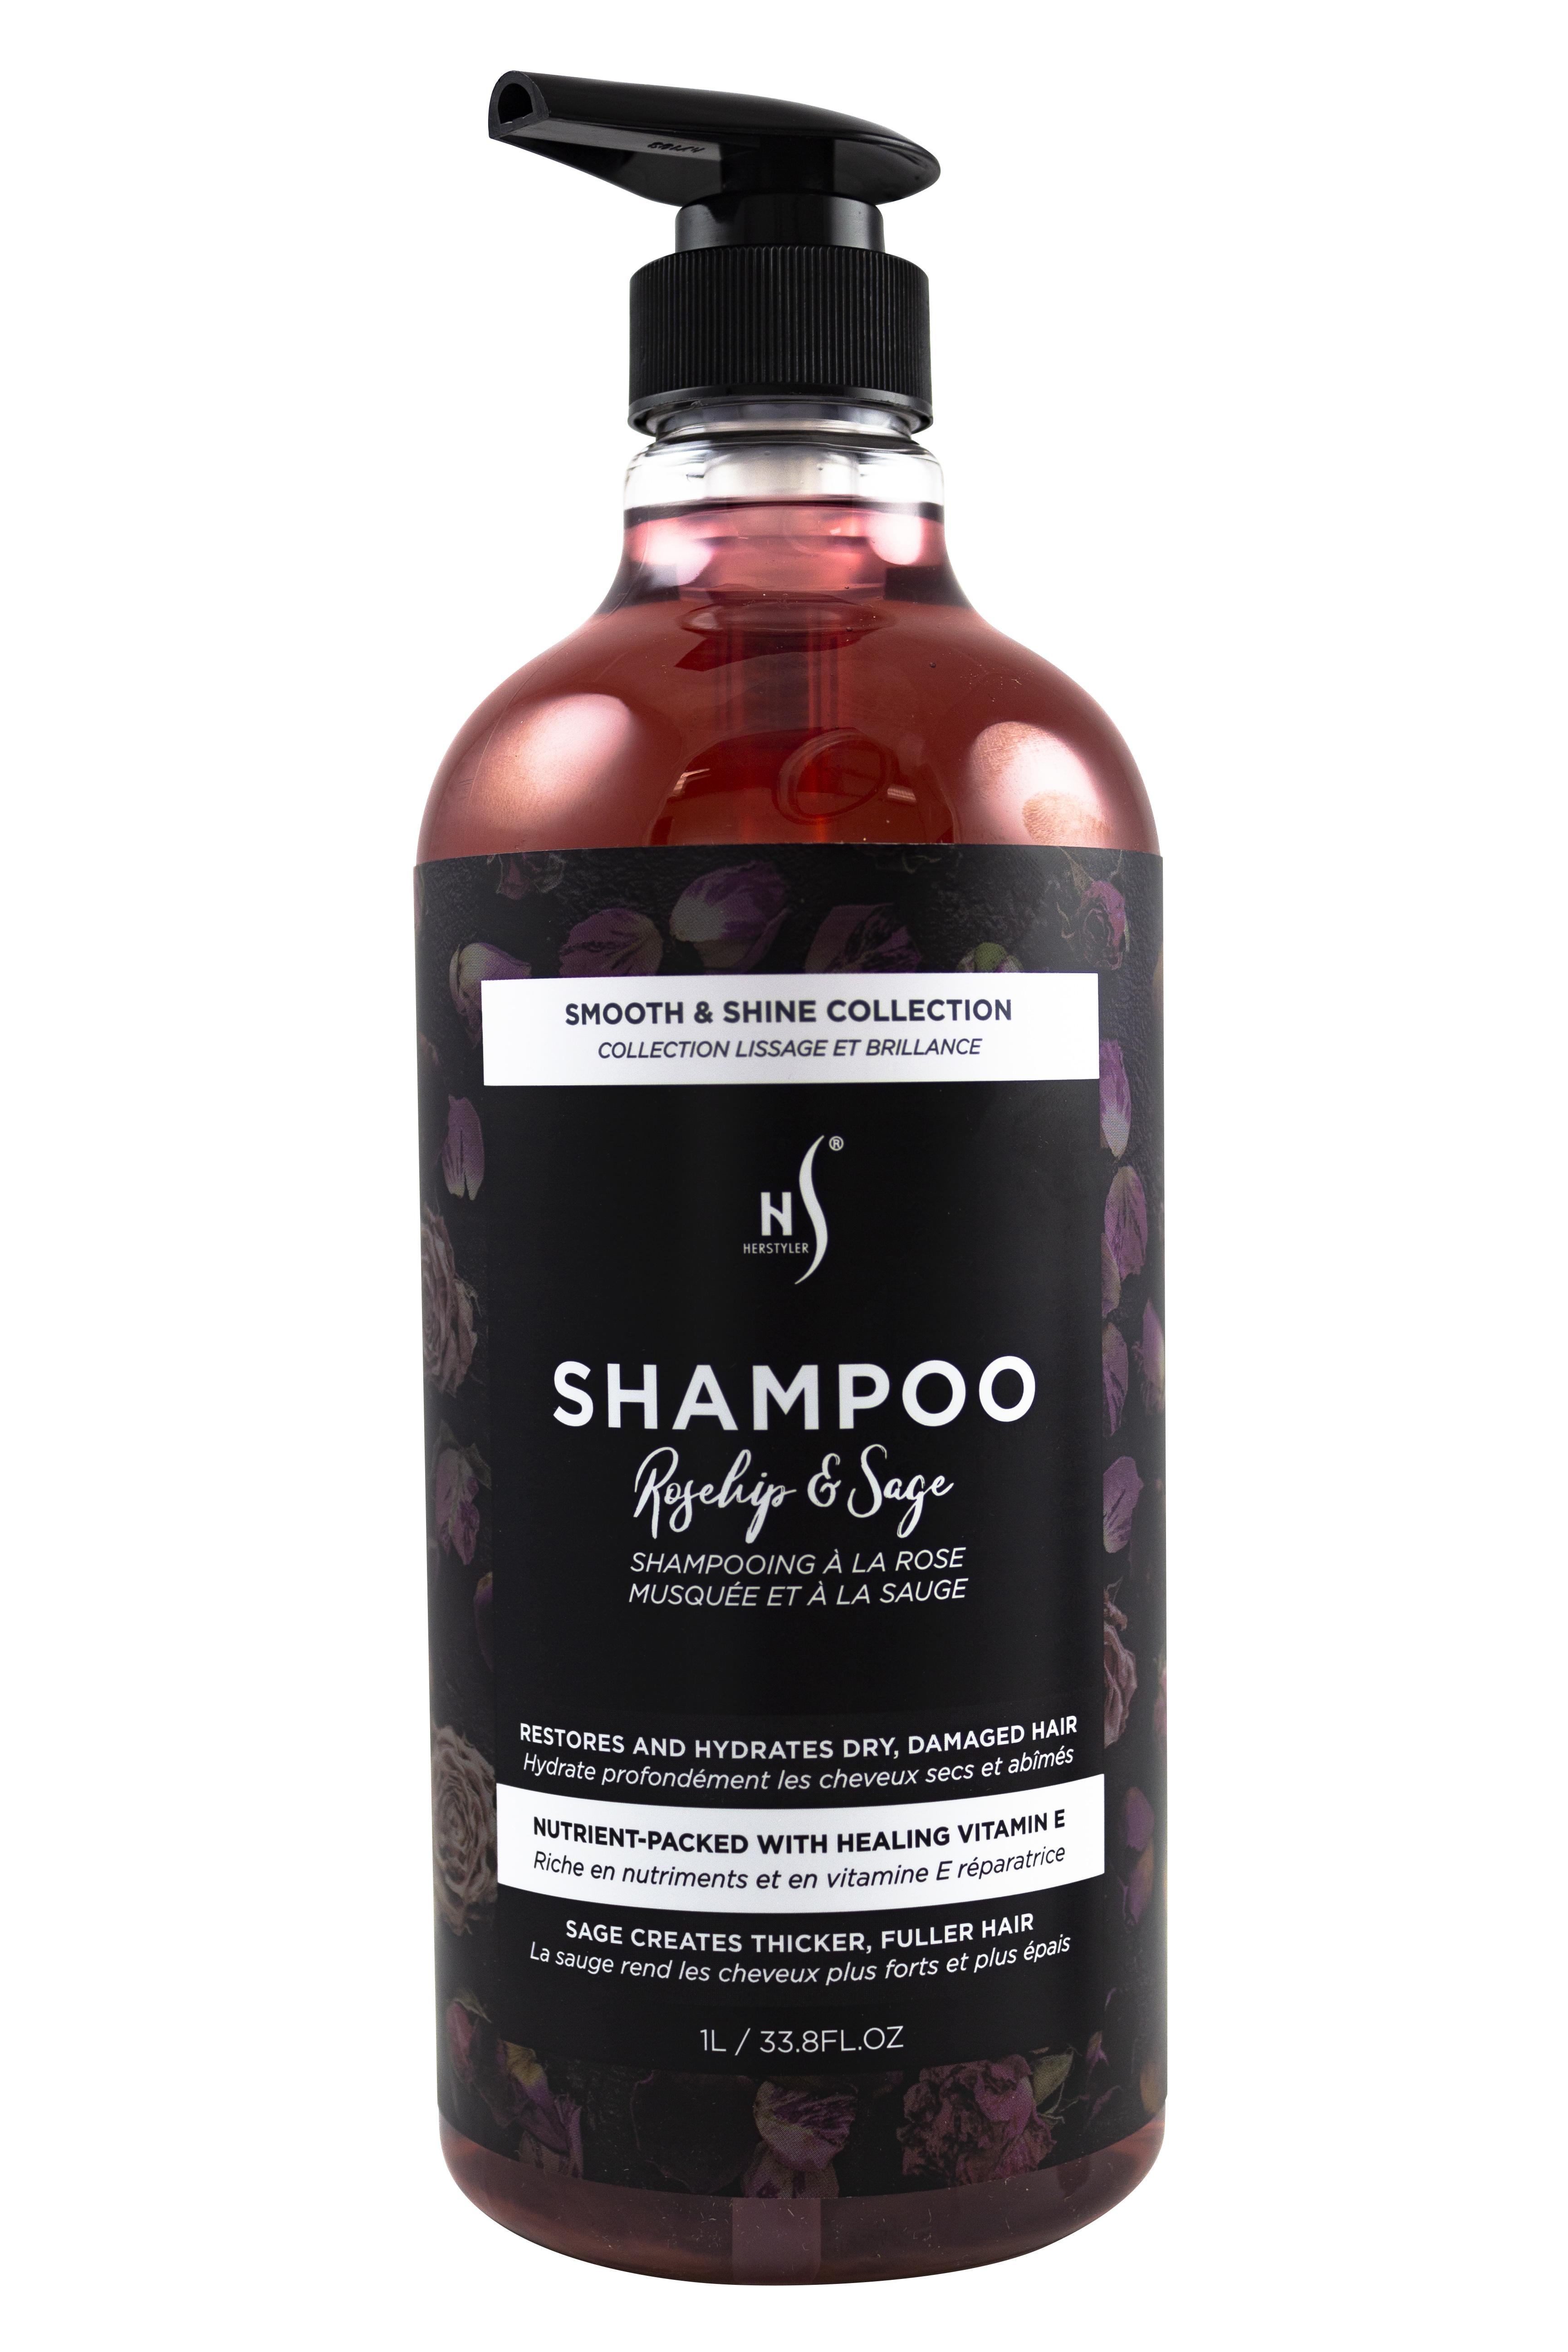 rosehip sage shampoo 1l